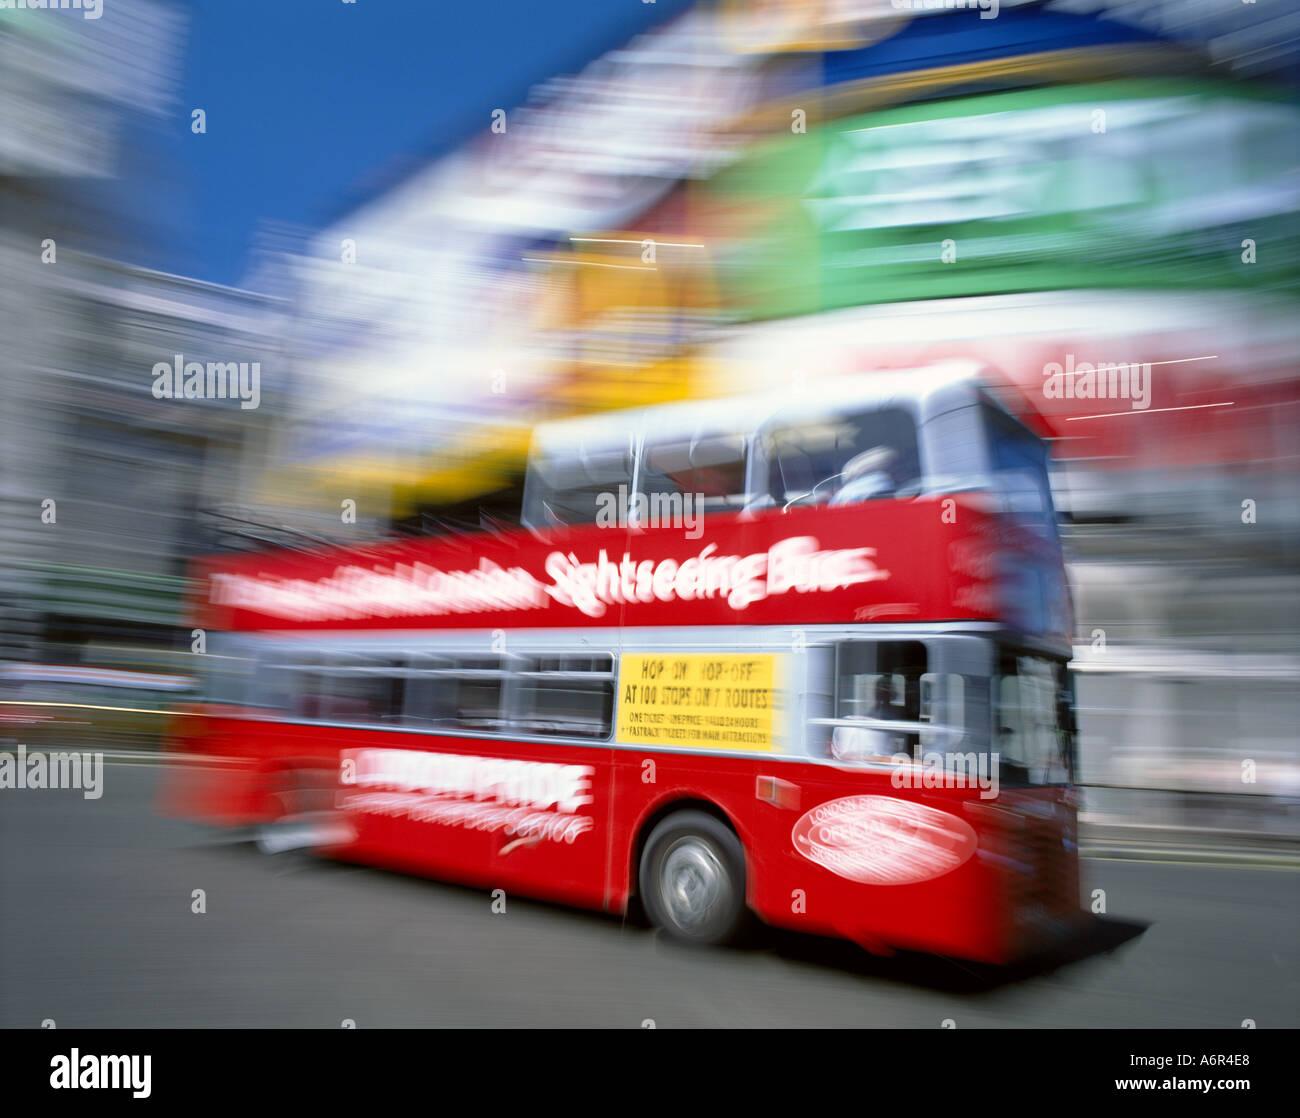 London Bus Picadilly Circus London - Stock Image